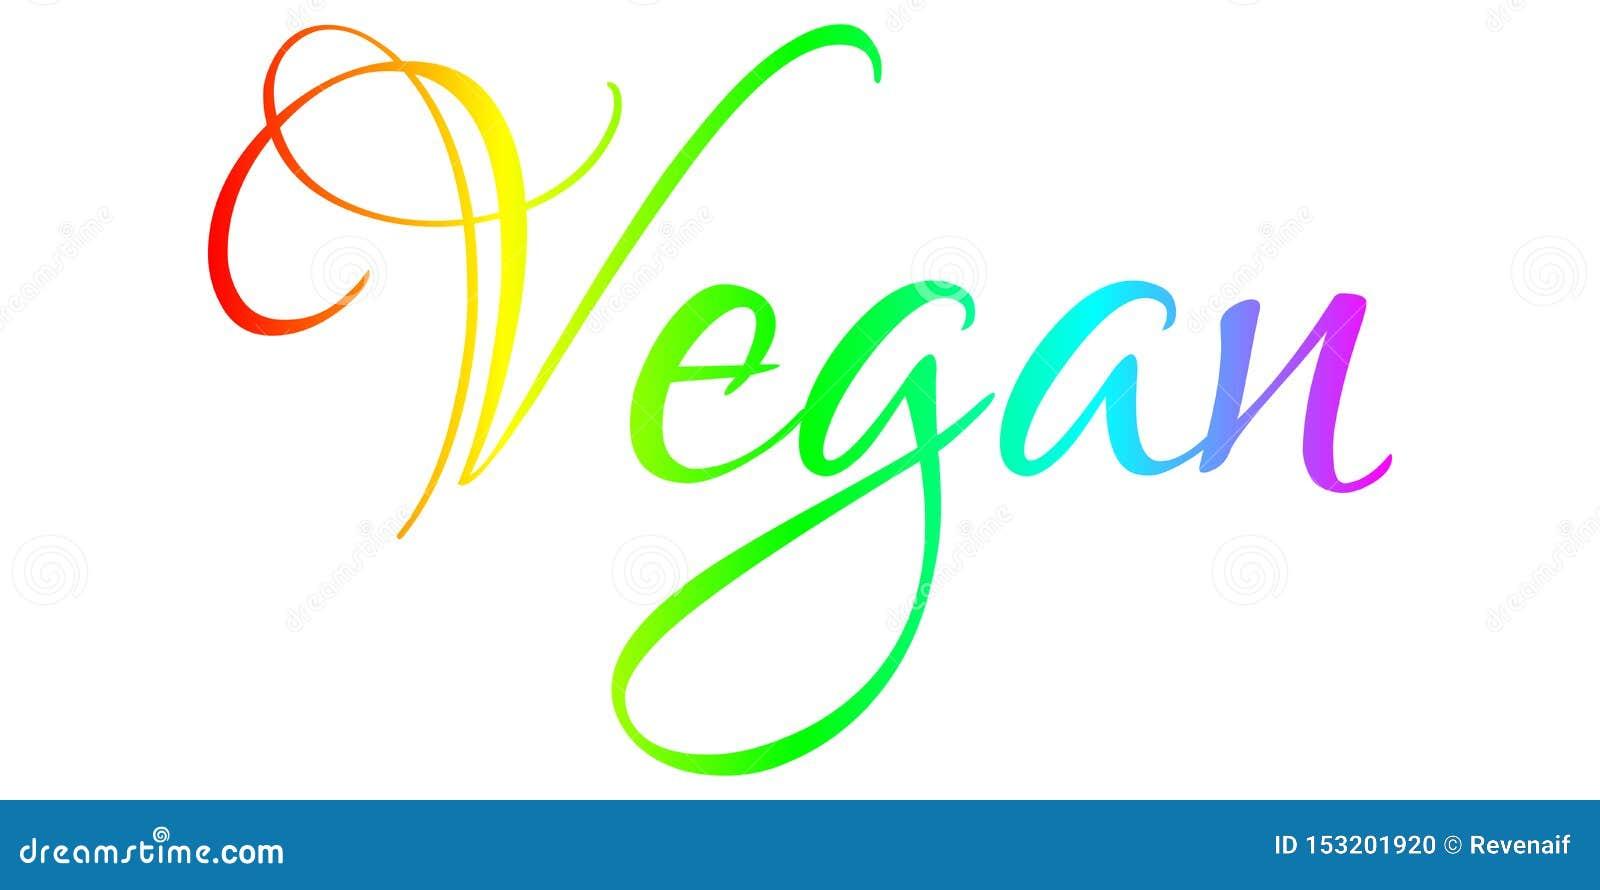 Vegan - Motivation, Philosophy, Lifestyle Banner